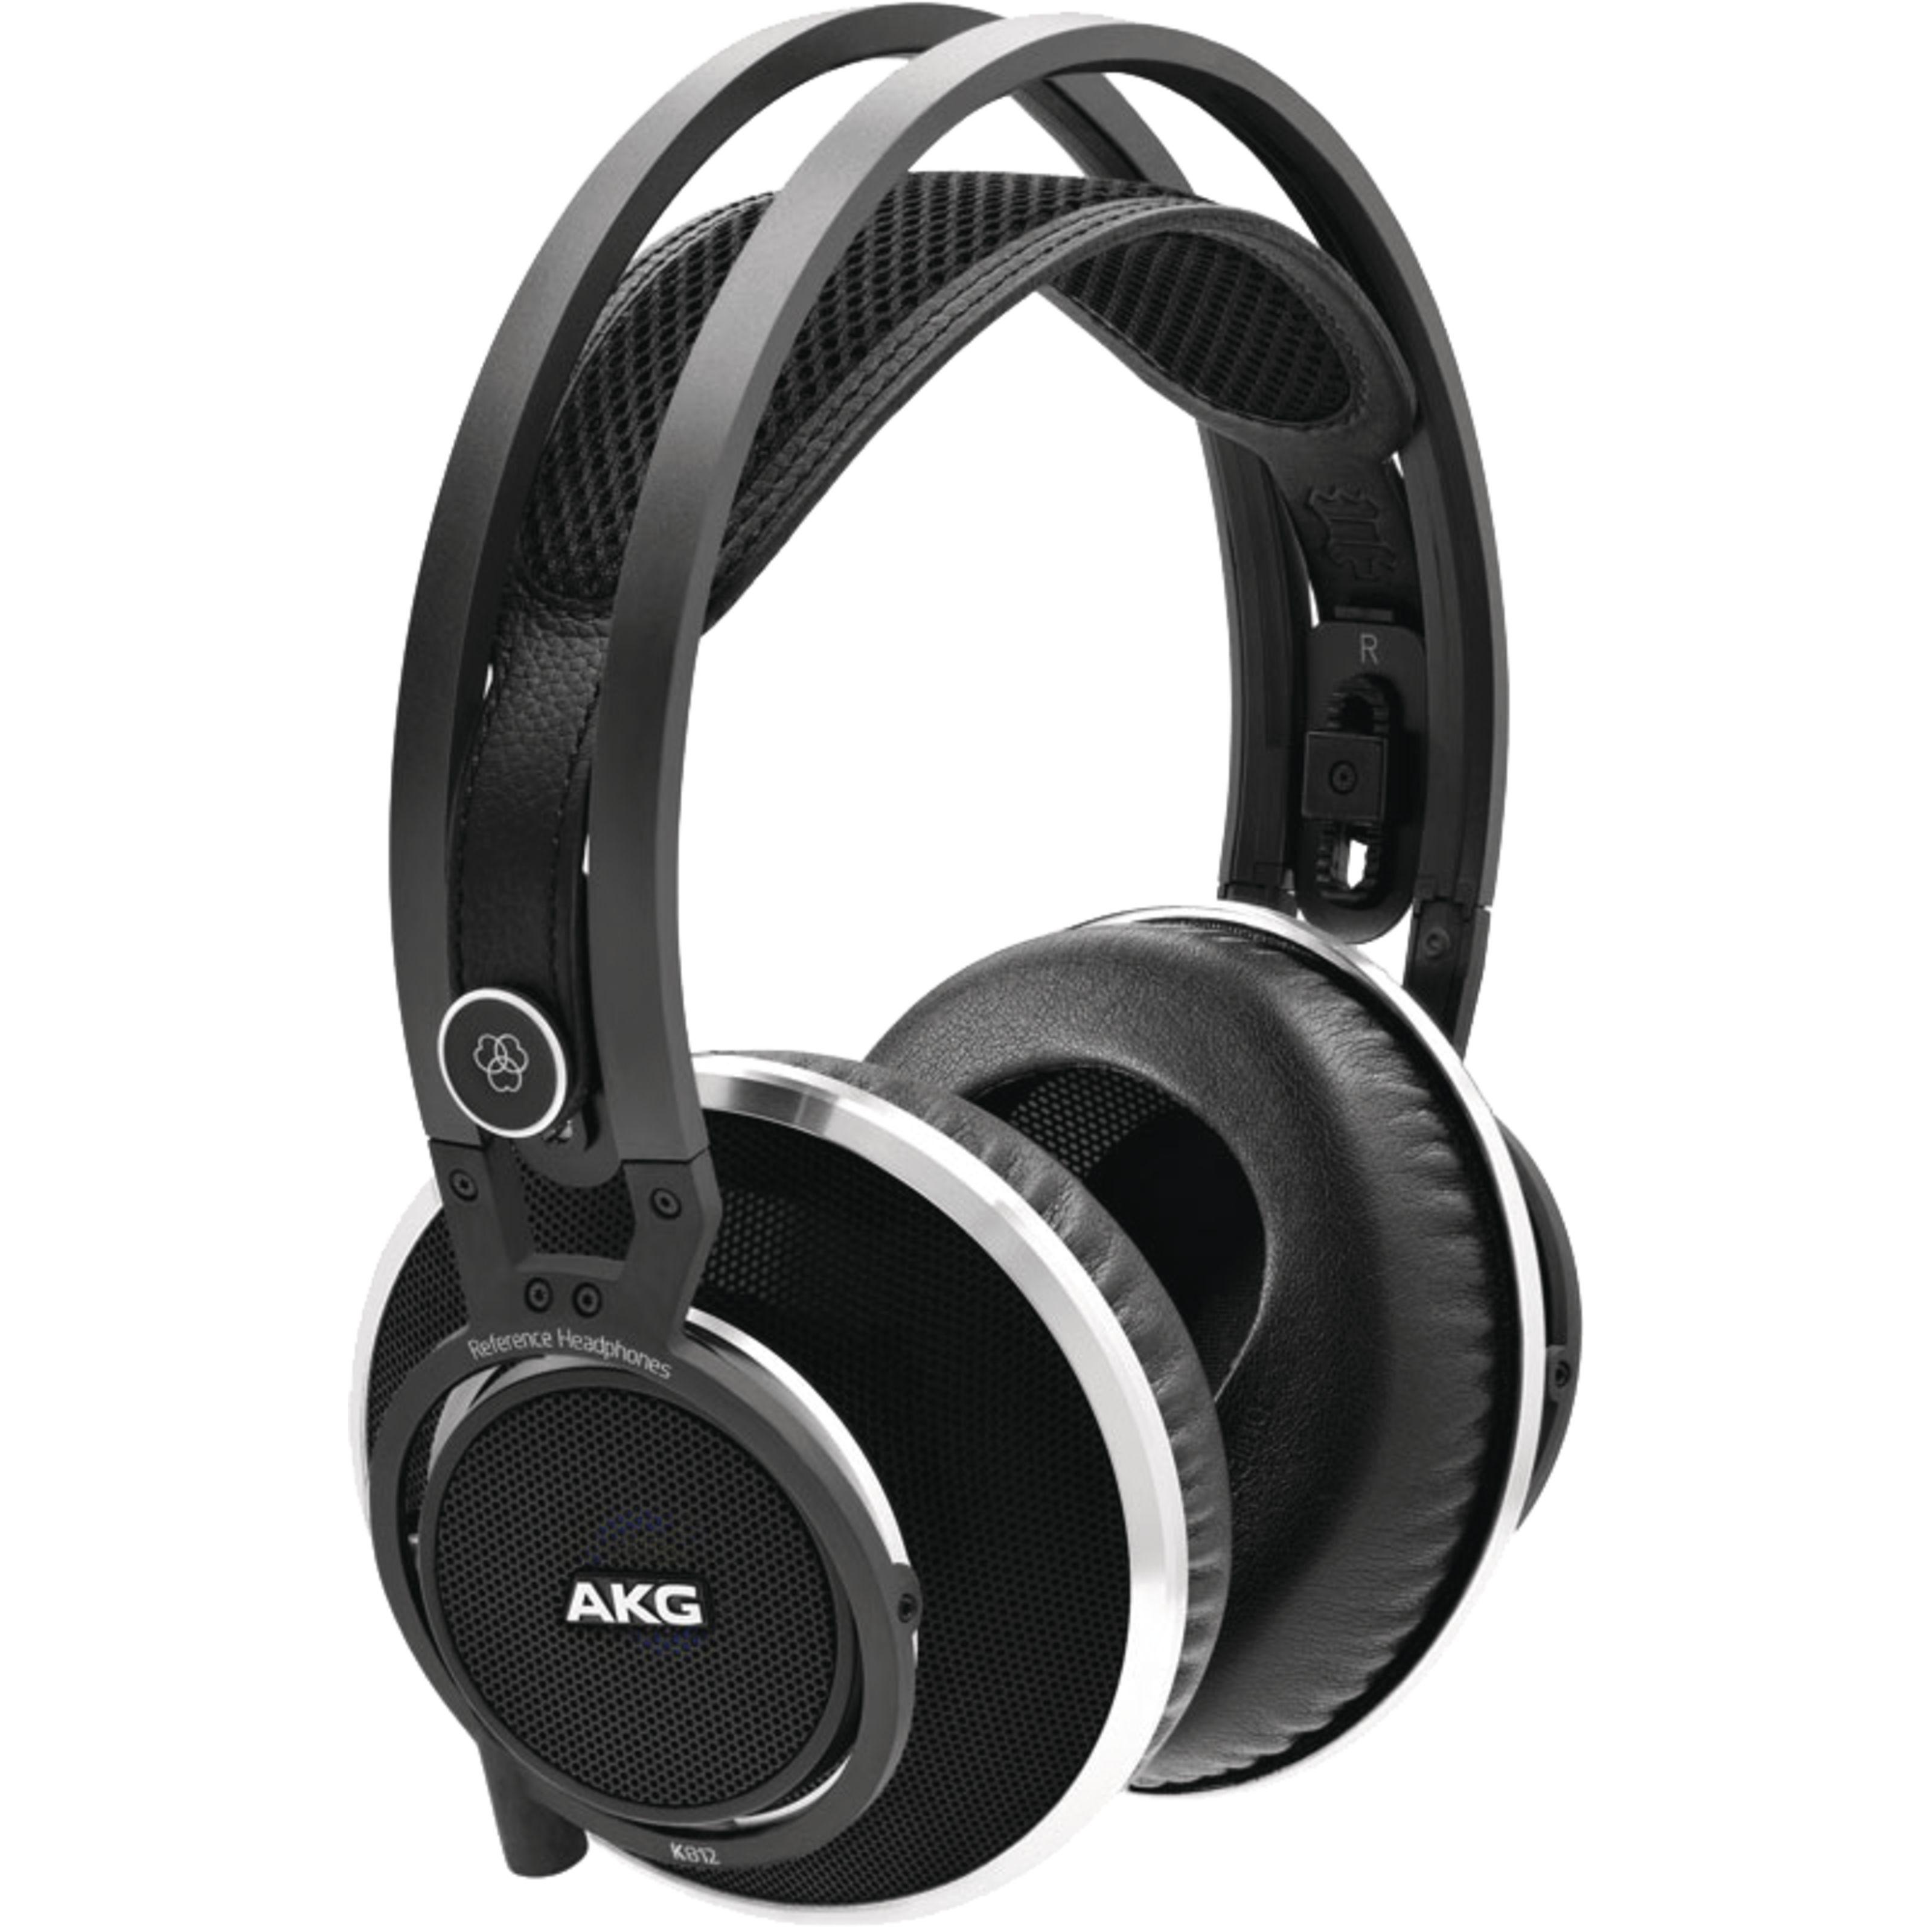 AKG - K812 offener High-End Kopfhörer